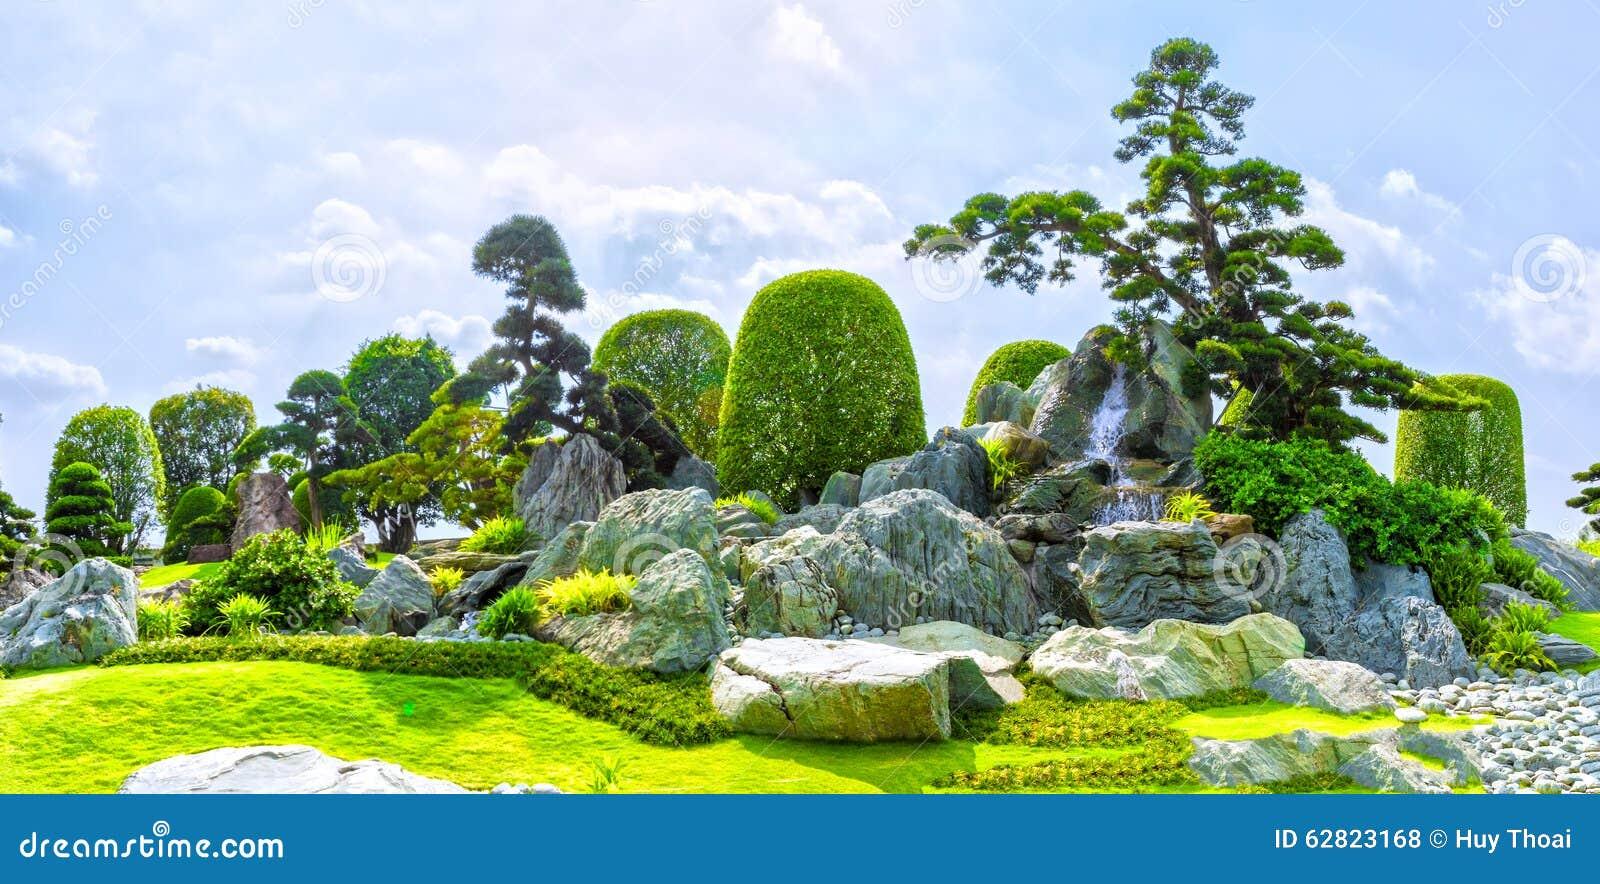 japanischer steingarten in vietnam stockfoto bild 62823168. Black Bedroom Furniture Sets. Home Design Ideas